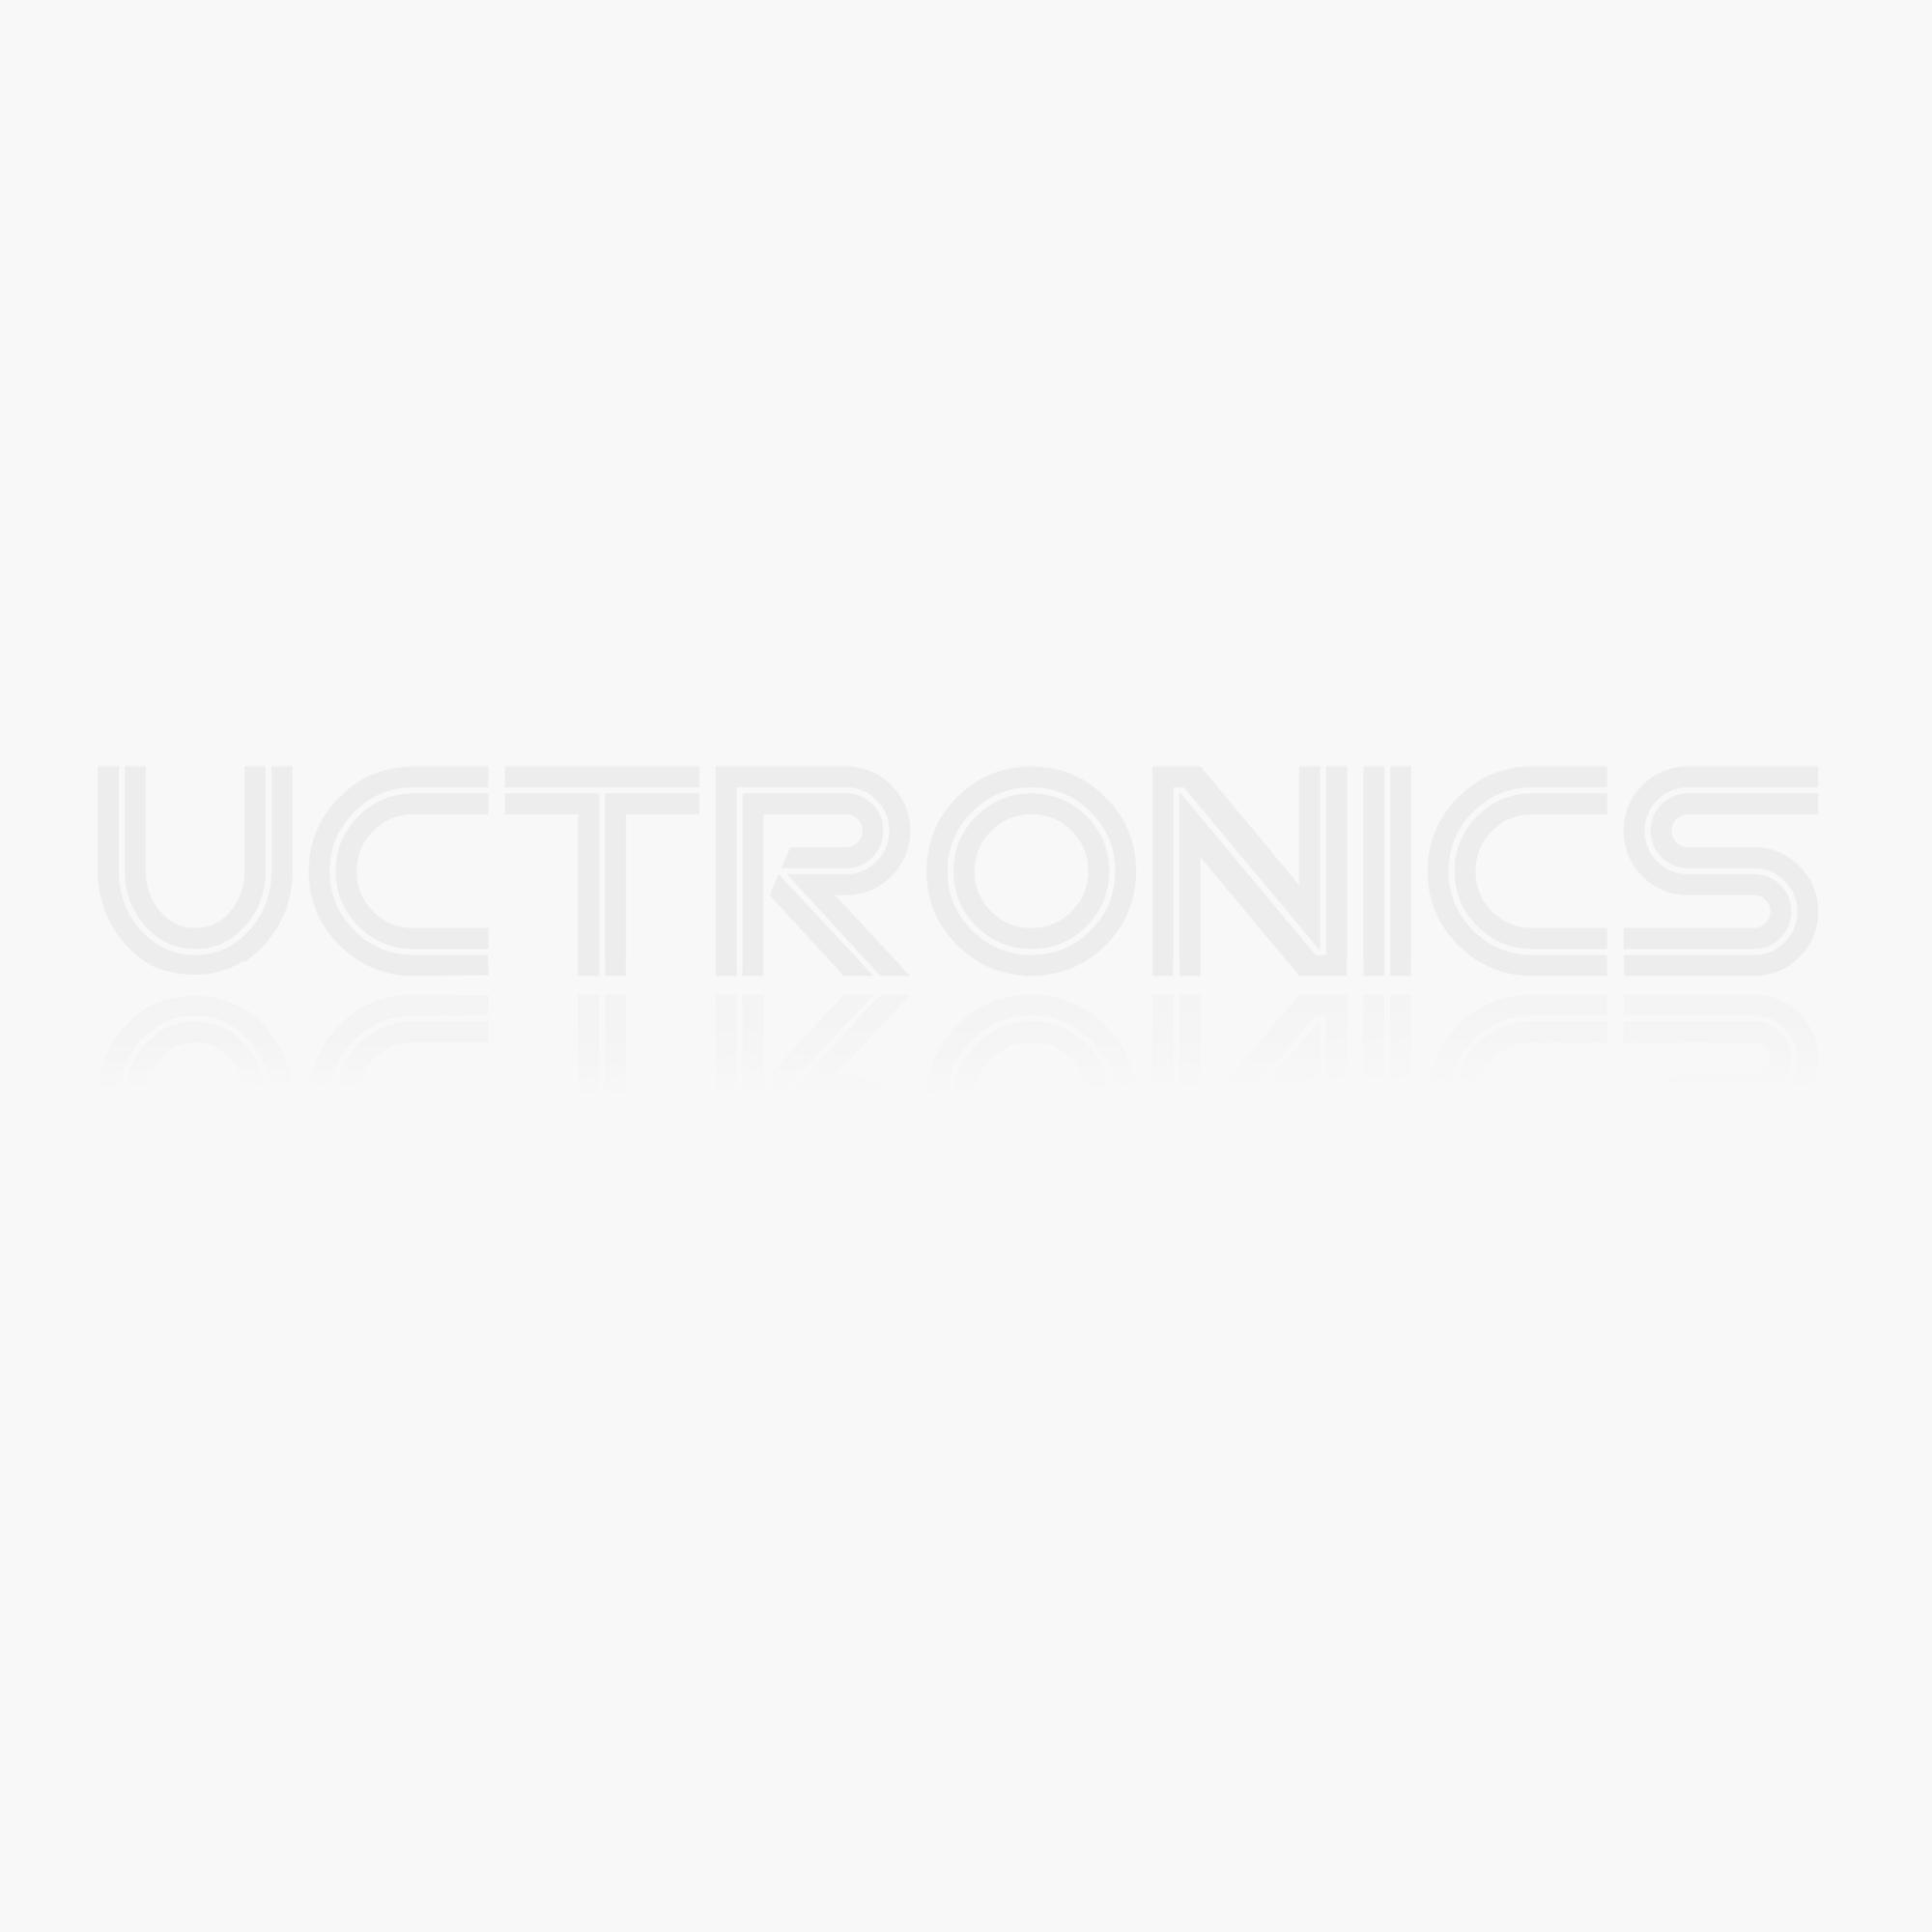 220V 1000W SCR Voltage Regulator Dimmer Speed Controller Thermostat Module